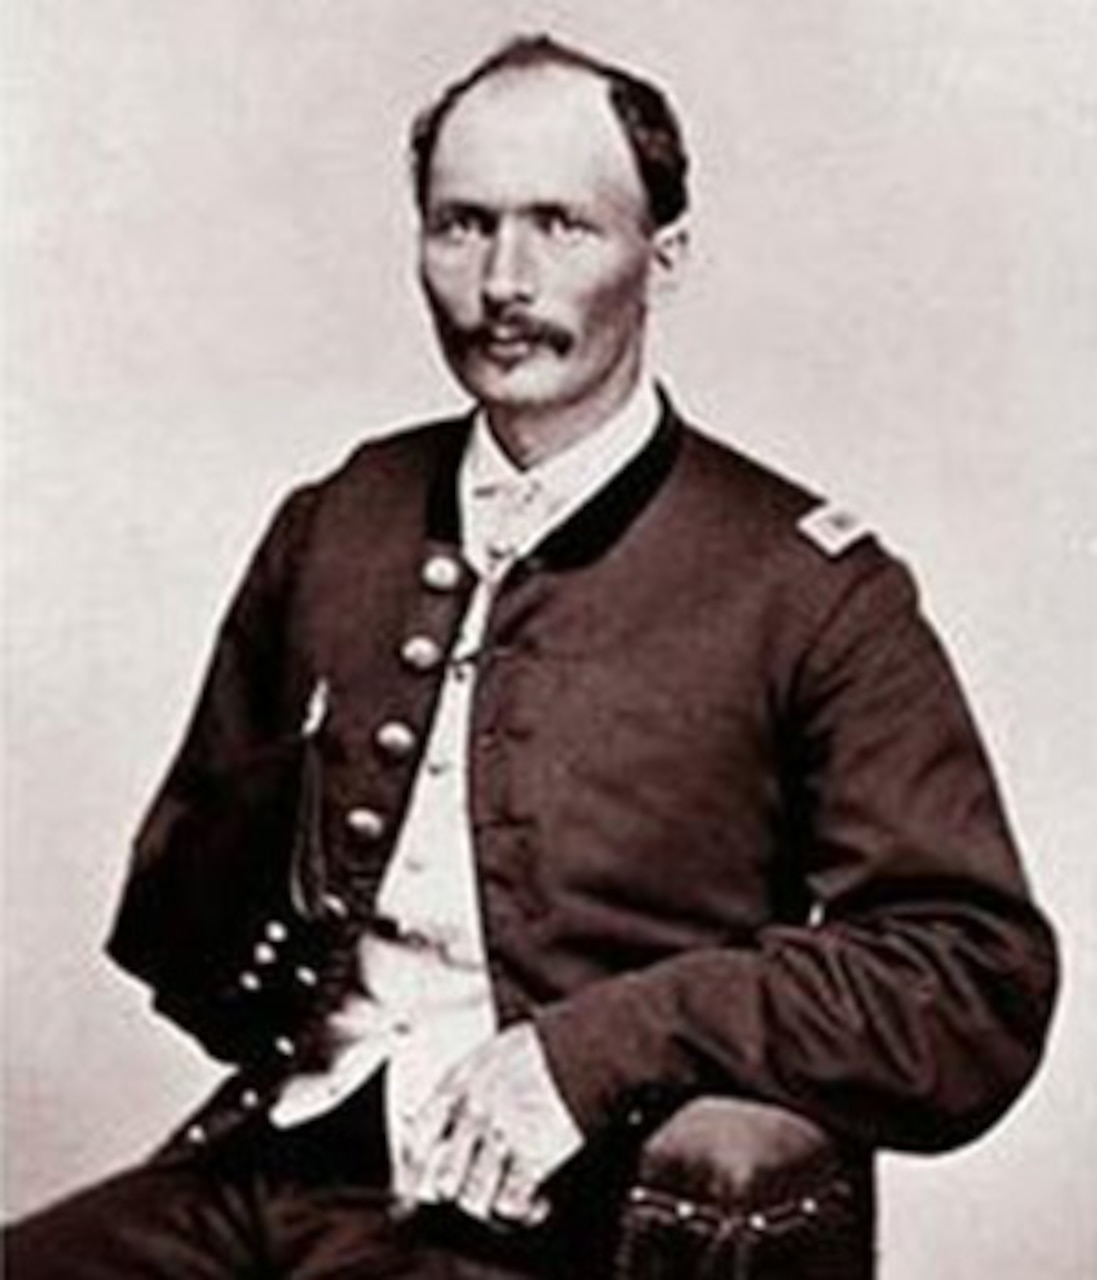 A soldier in a Civil War-era uniform sits for a photo.